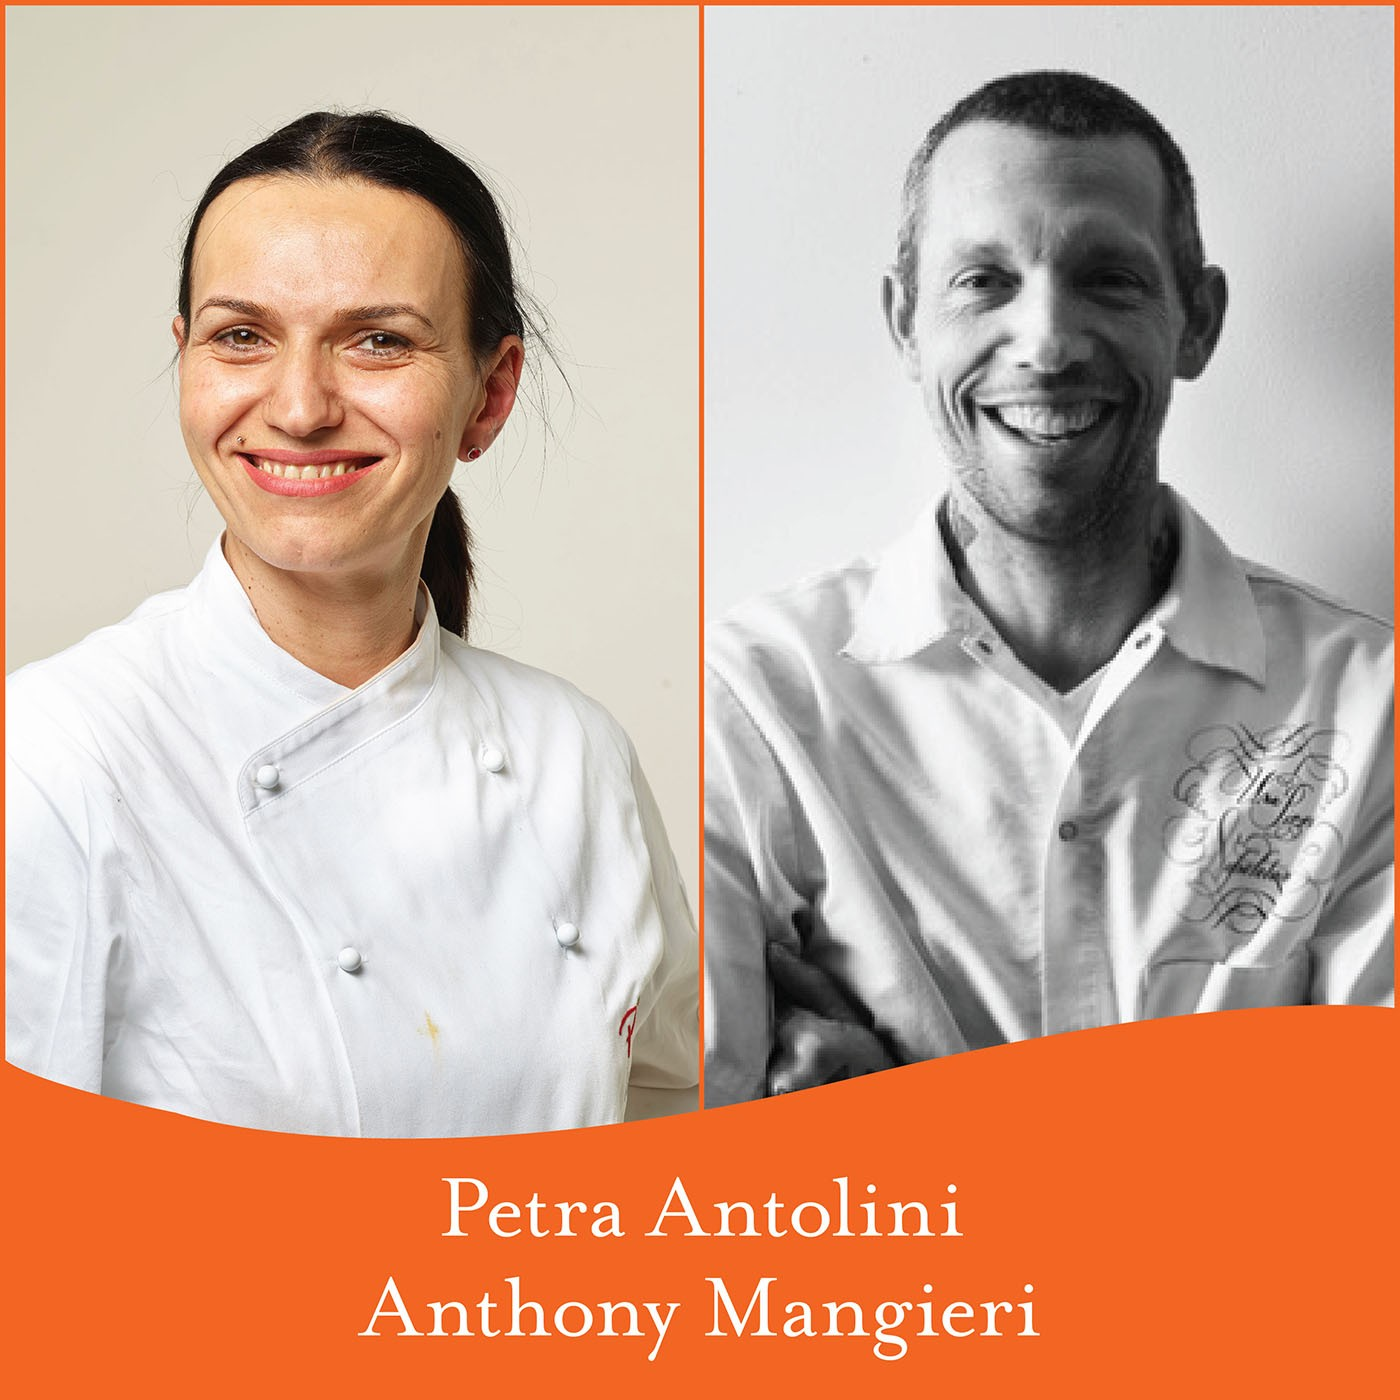 Identita' Golose 2019: Seminar with Petra Antolini & Anthony Mangieri at La Scuola